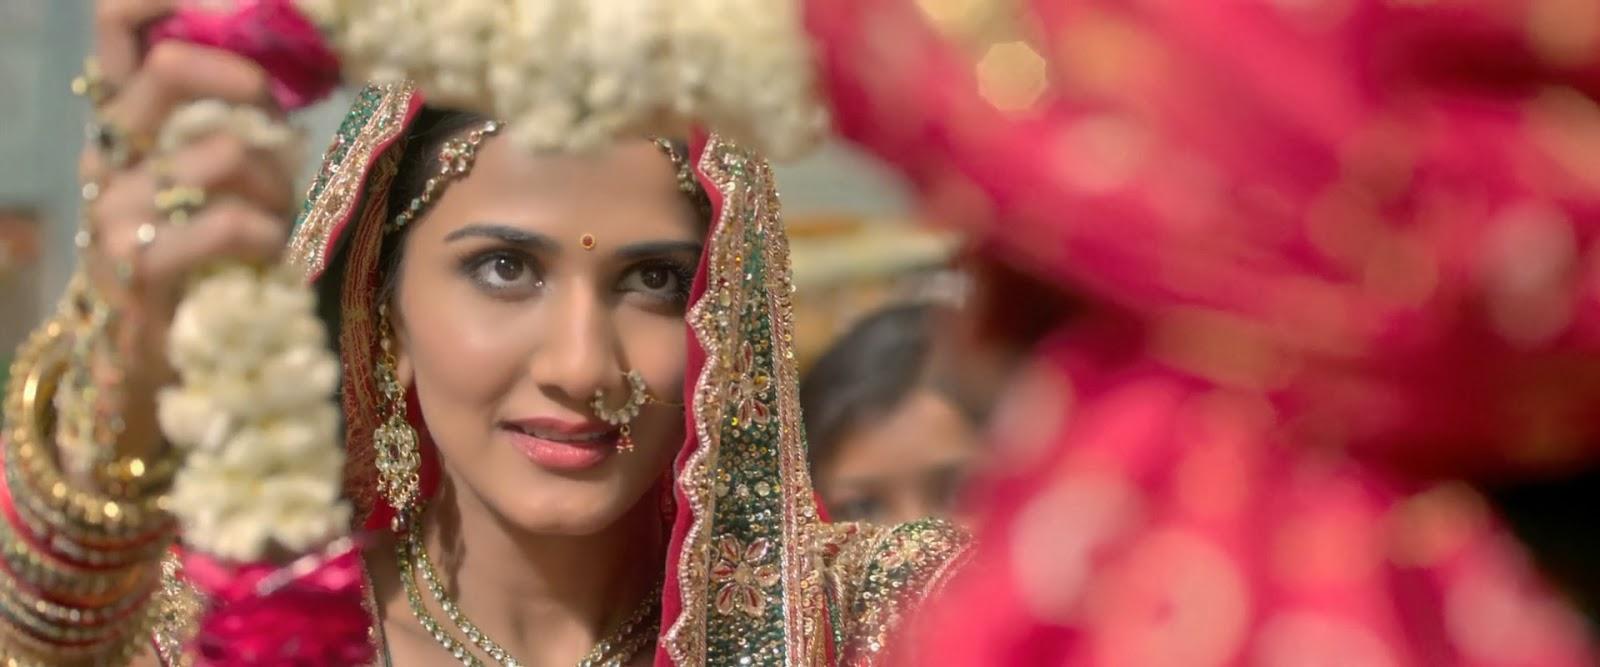 Shuddh Desi Romance (2013) S2 s Shuddh Desi Romance (2013)